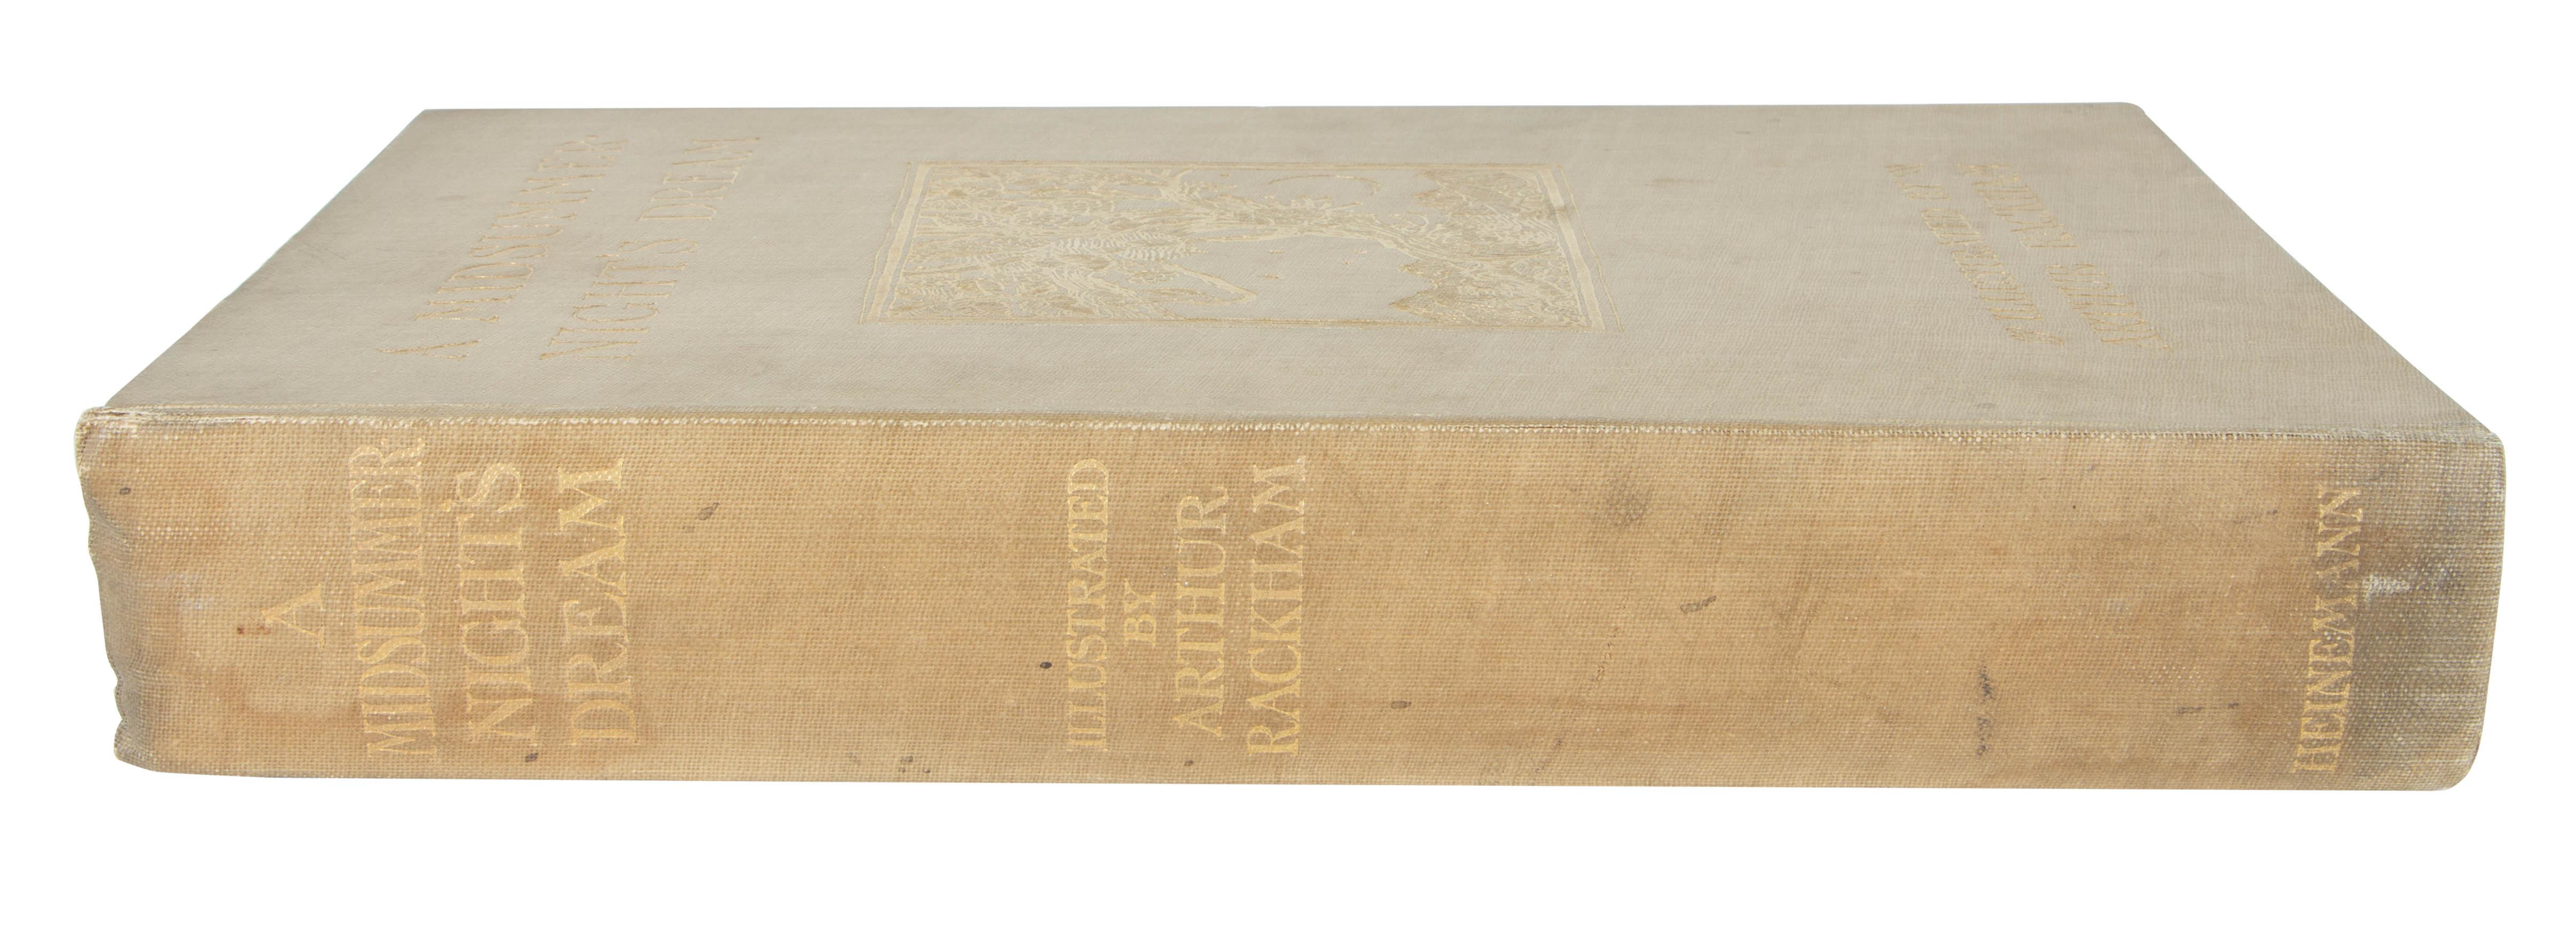 1908 MIDSUMMER NIGHT'S DREAM BY WILLIAM SHAKESPEARE, ILLUSTRATIONS BY ARTHUR RACKHAM - Image 2 of 7